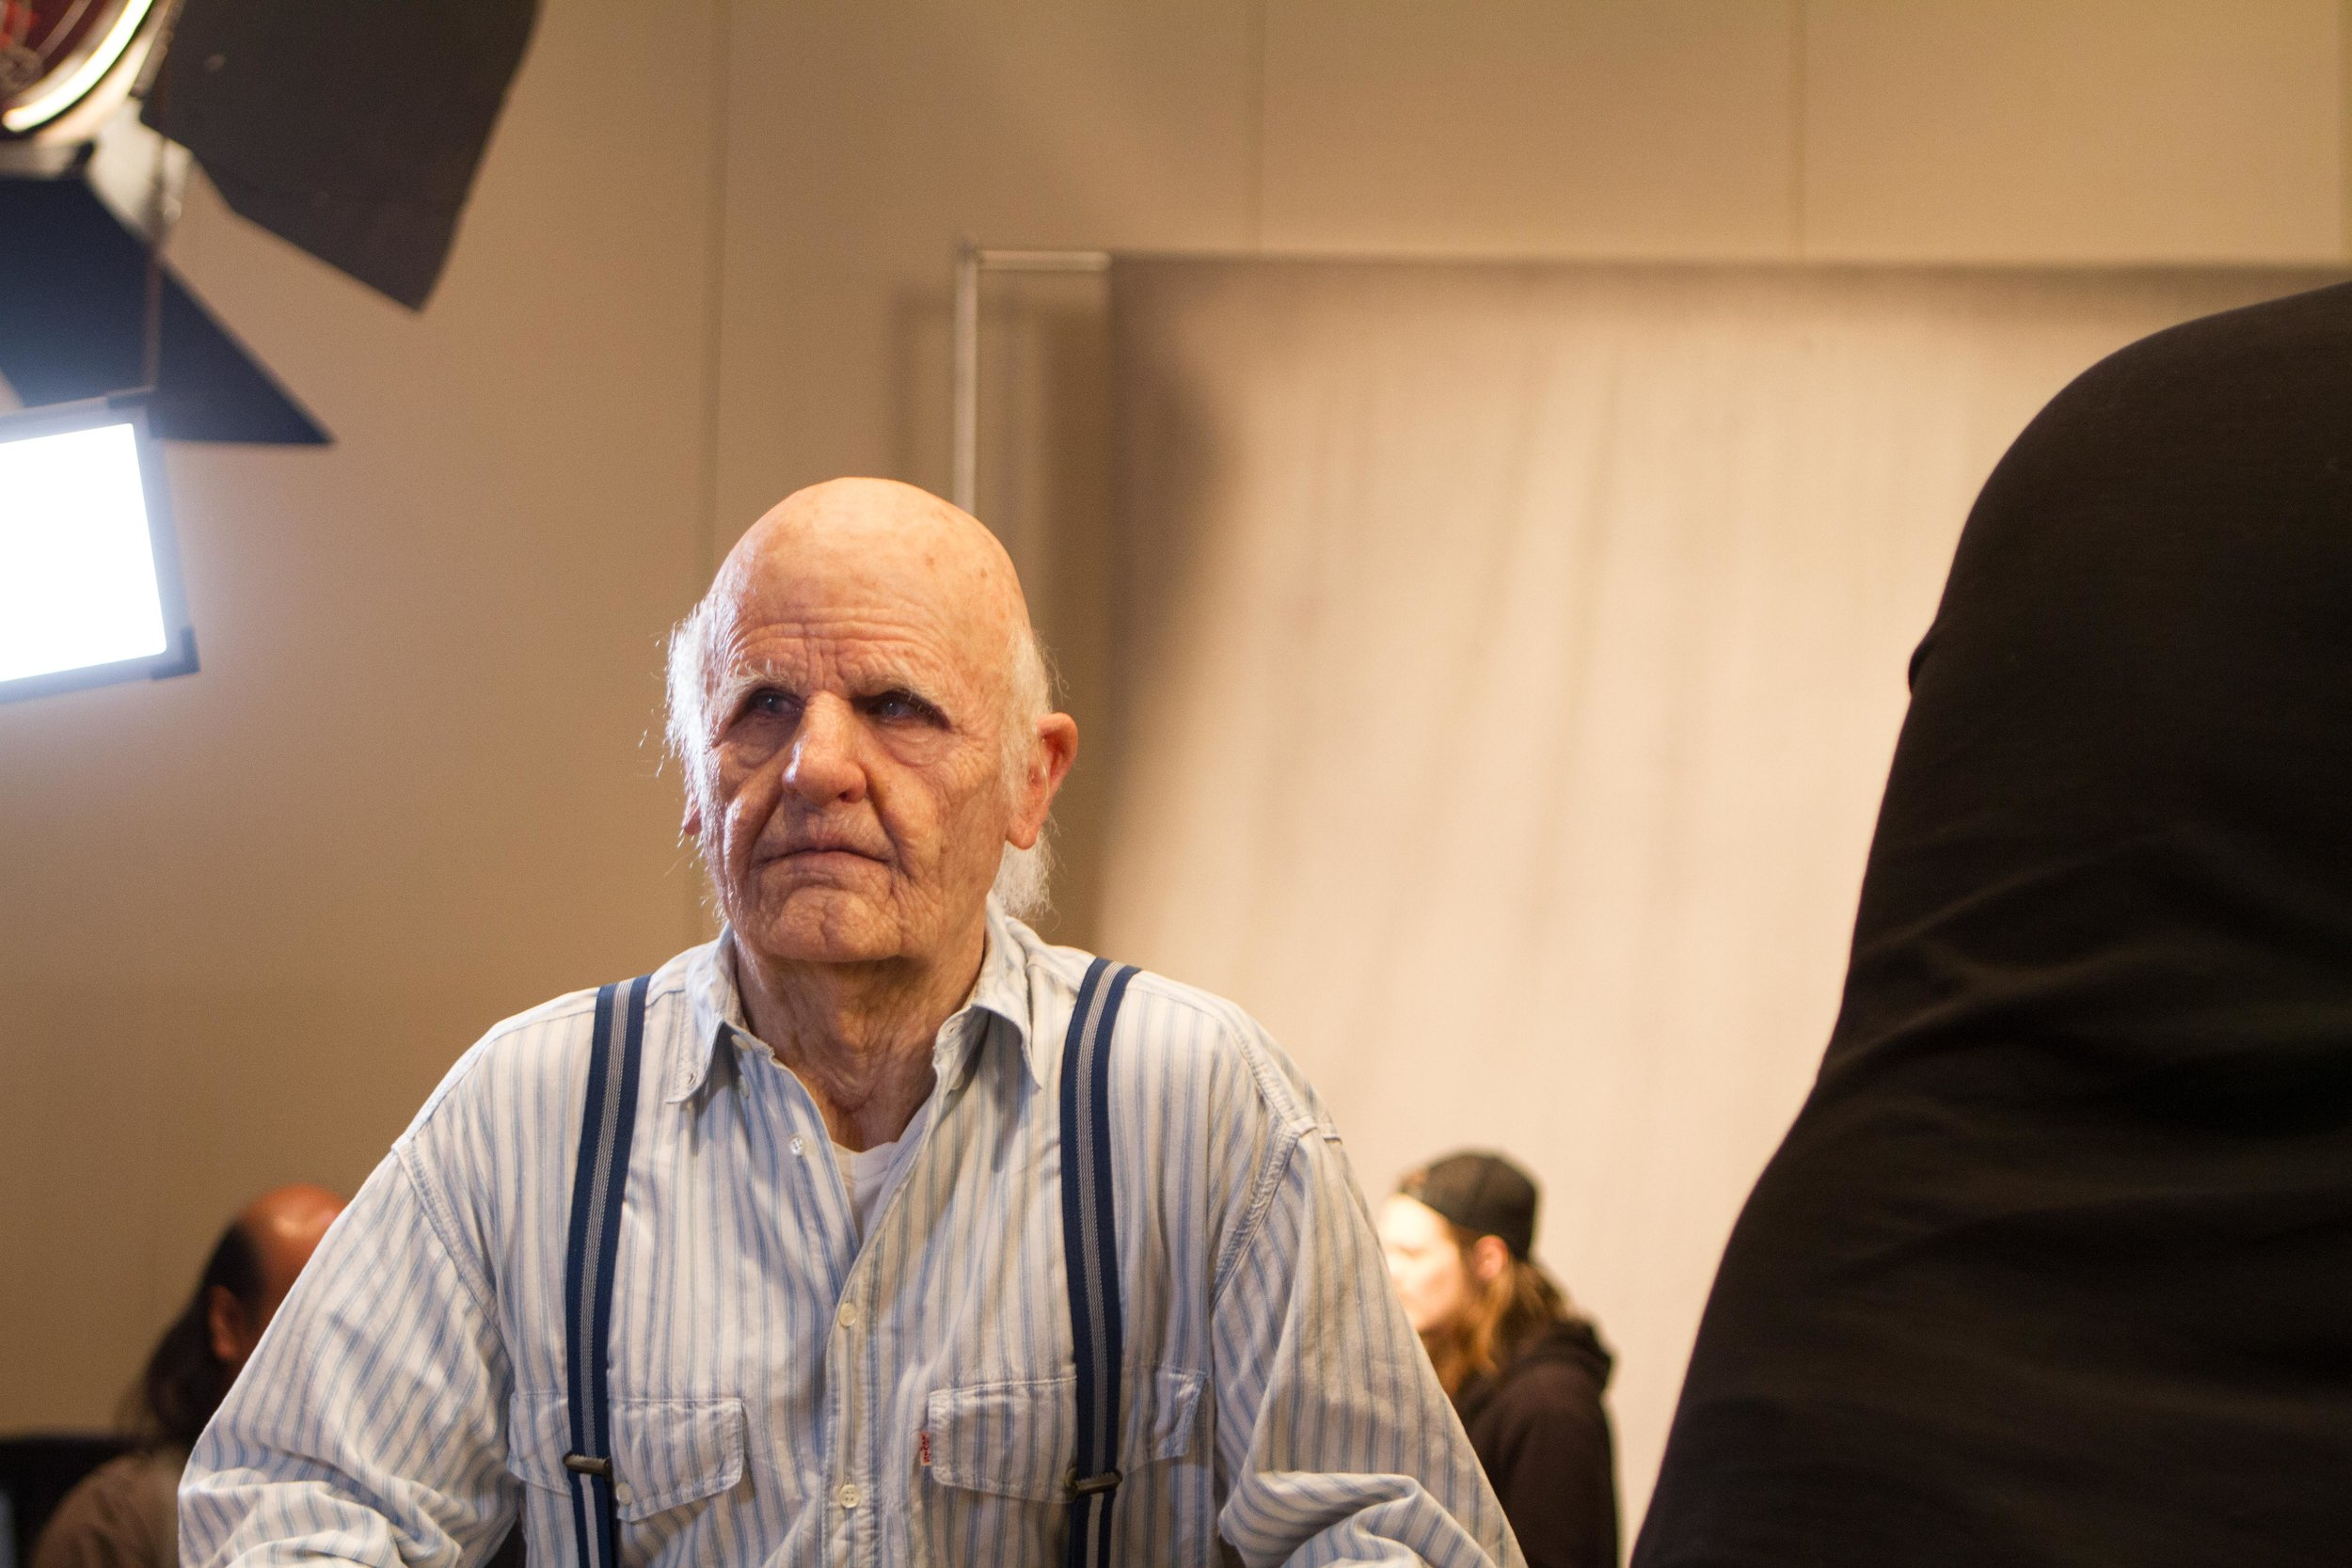 IMATS 2017 - Richard Redlefsen Old Age Special Effects (www.KyleReaArt.com - www.KyleReaPhotography.com) 9.jpg